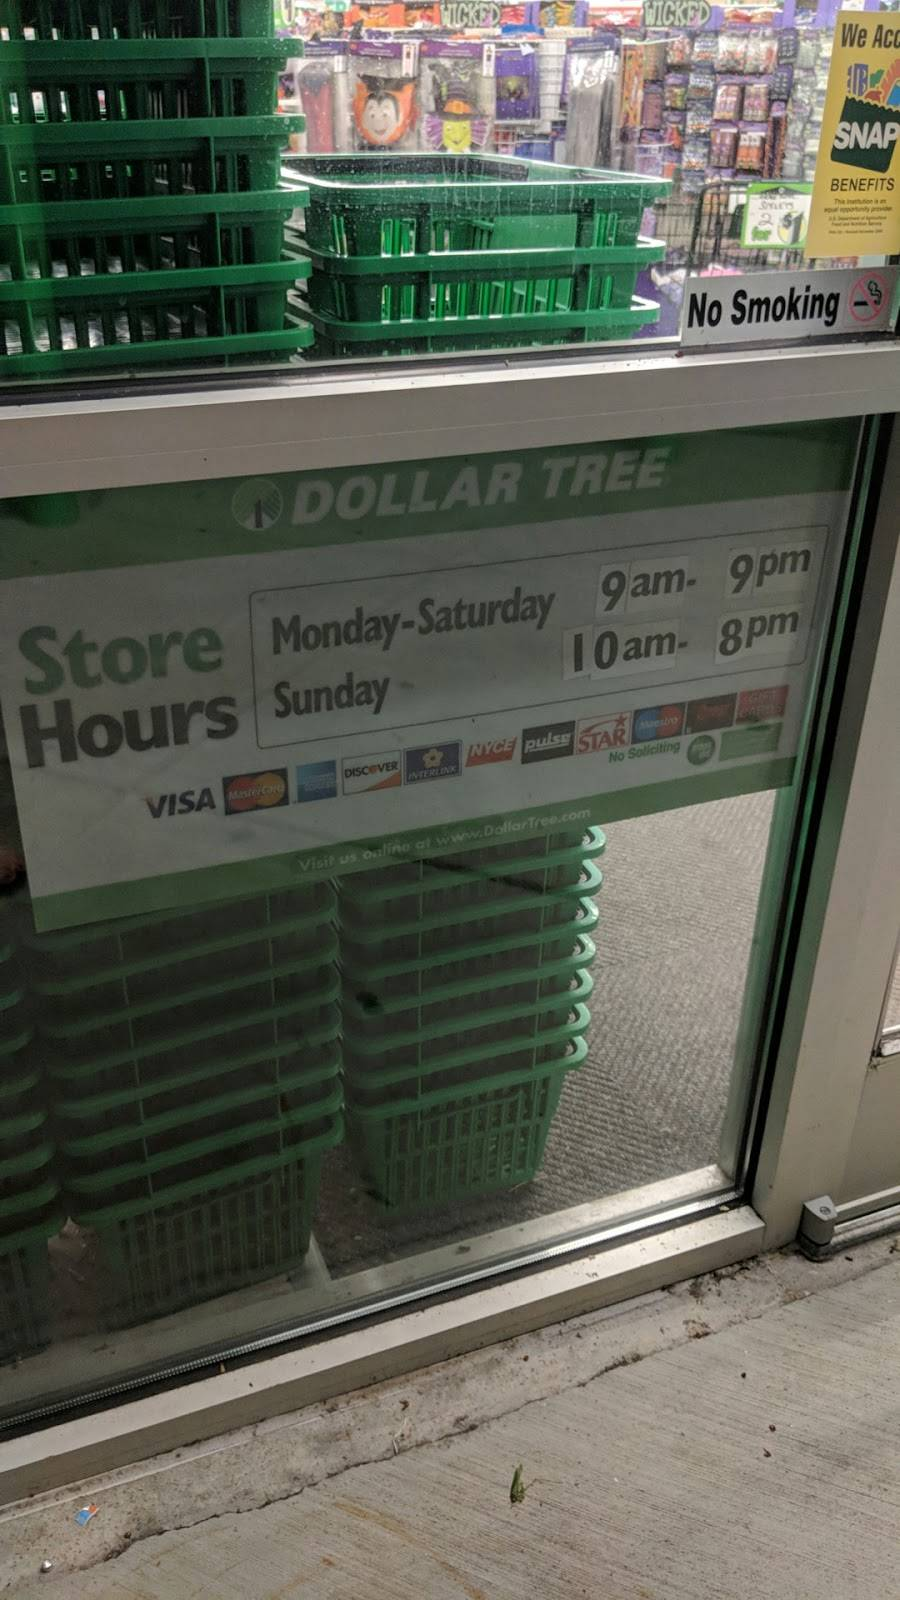 Dollar Tree - furniture store  | Photo 4 of 4 | Address: 2703 Lake Wheeler Rd, Raleigh, NC 27603, USA | Phone: (919) 334-5304